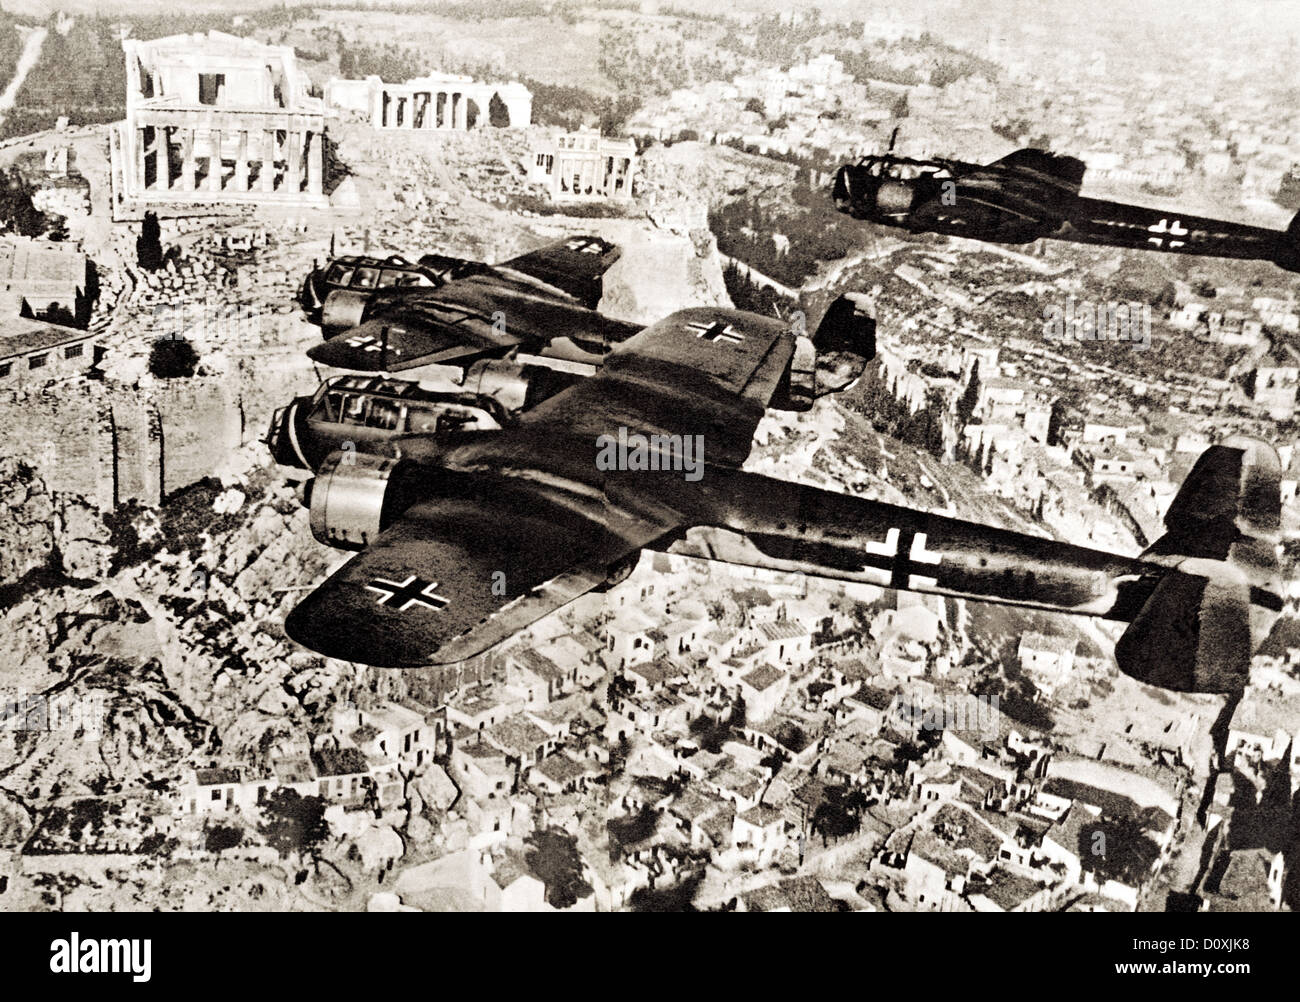 Luftwaffe, Two, German, Dornier, Do 17, aircraft, flying, Athens, Acropolis, bomber, Luftwaffe bomber types until - Stock Image